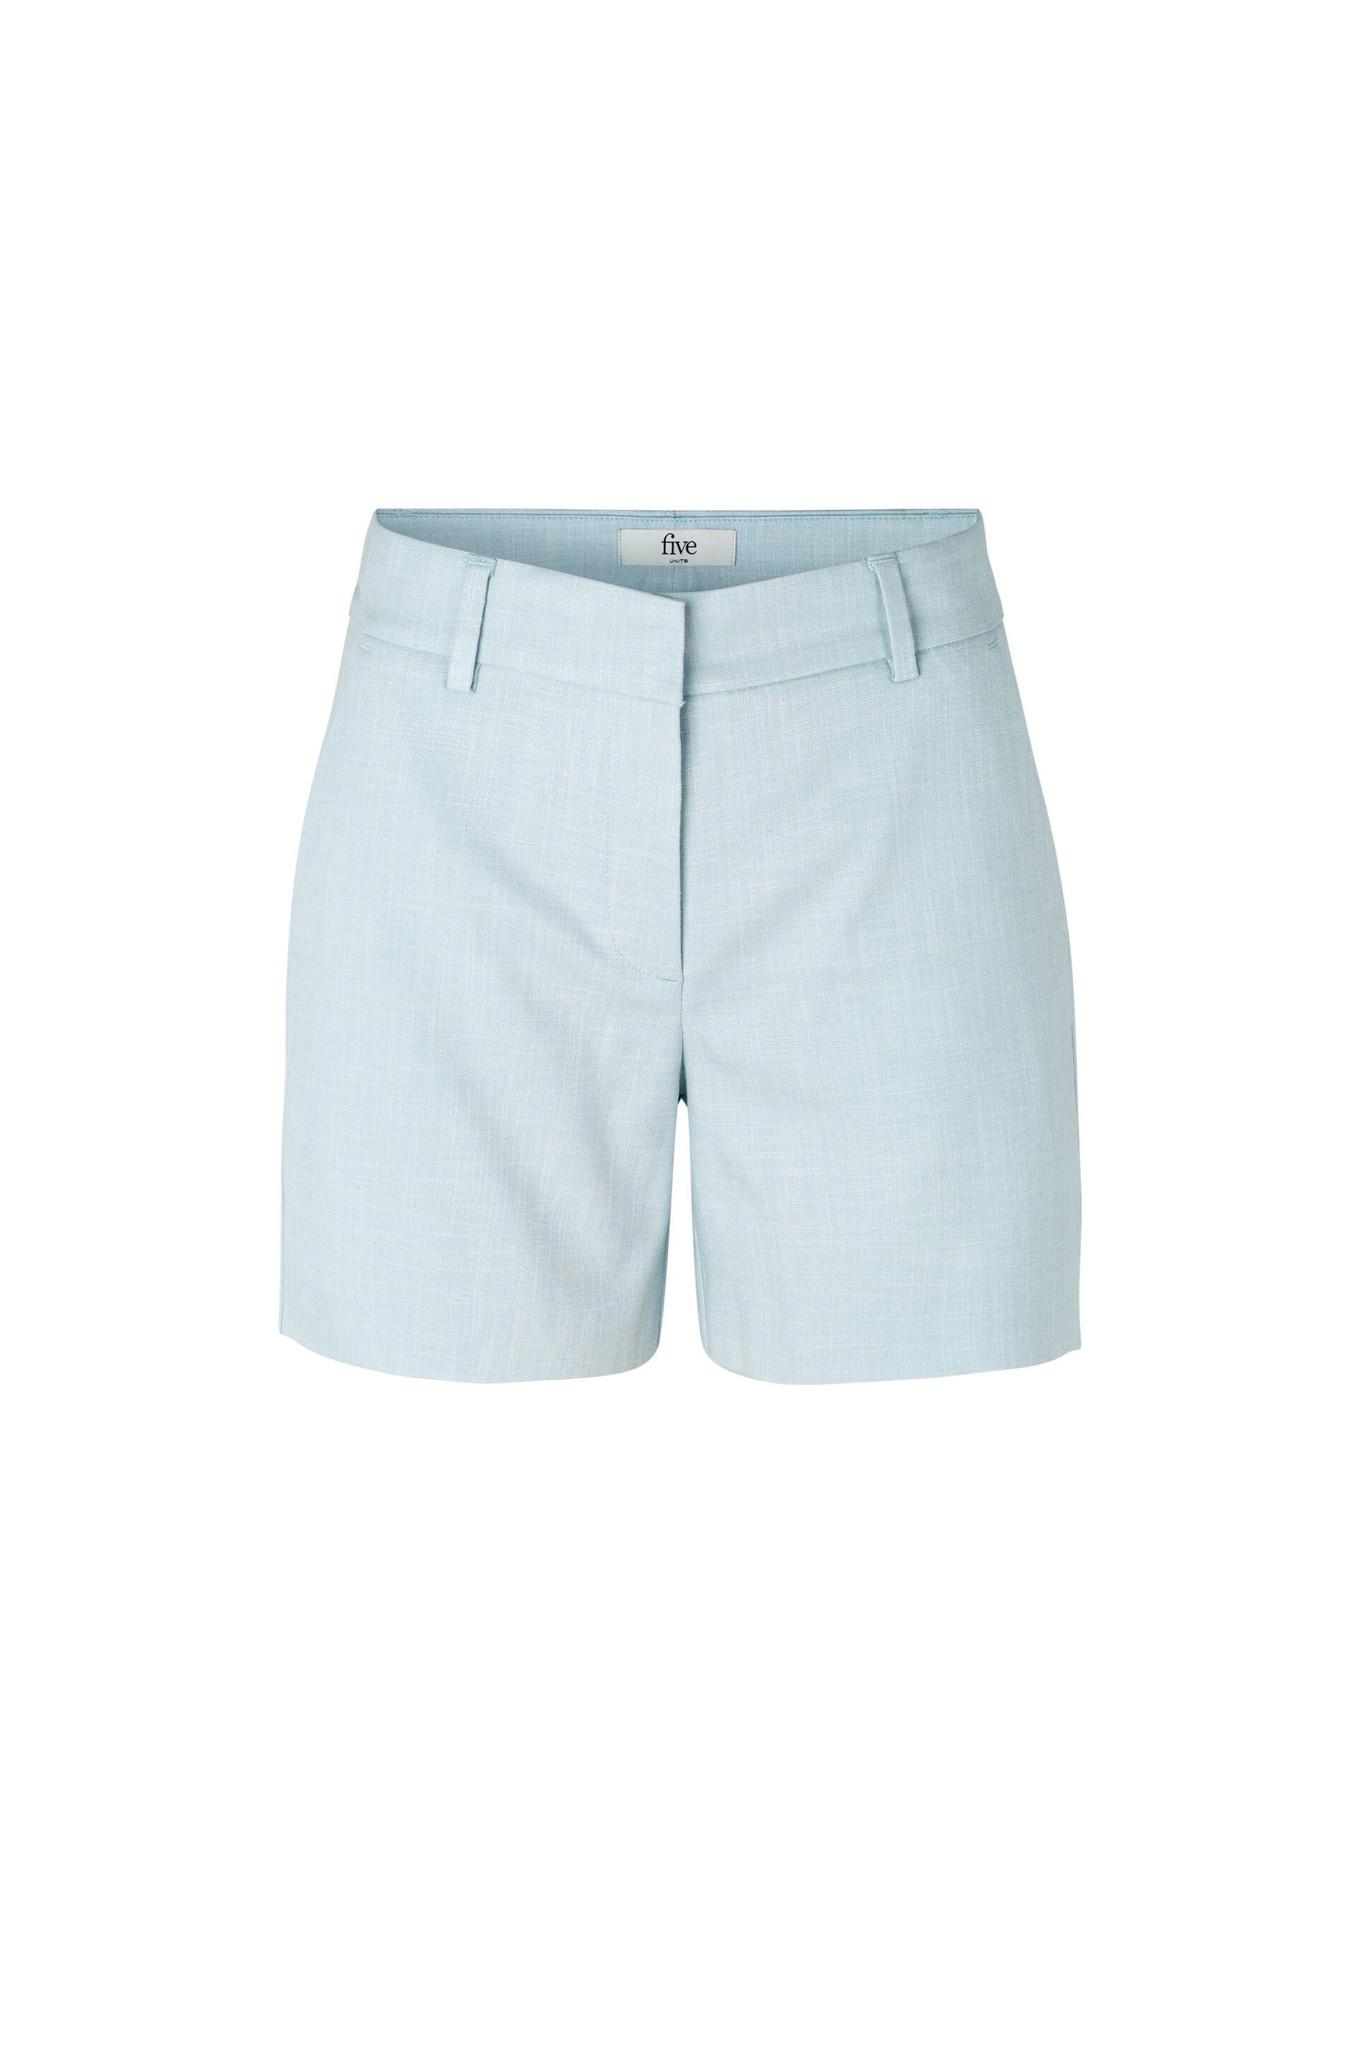 Dena Shorts 721 - Sky Blue Melange-1